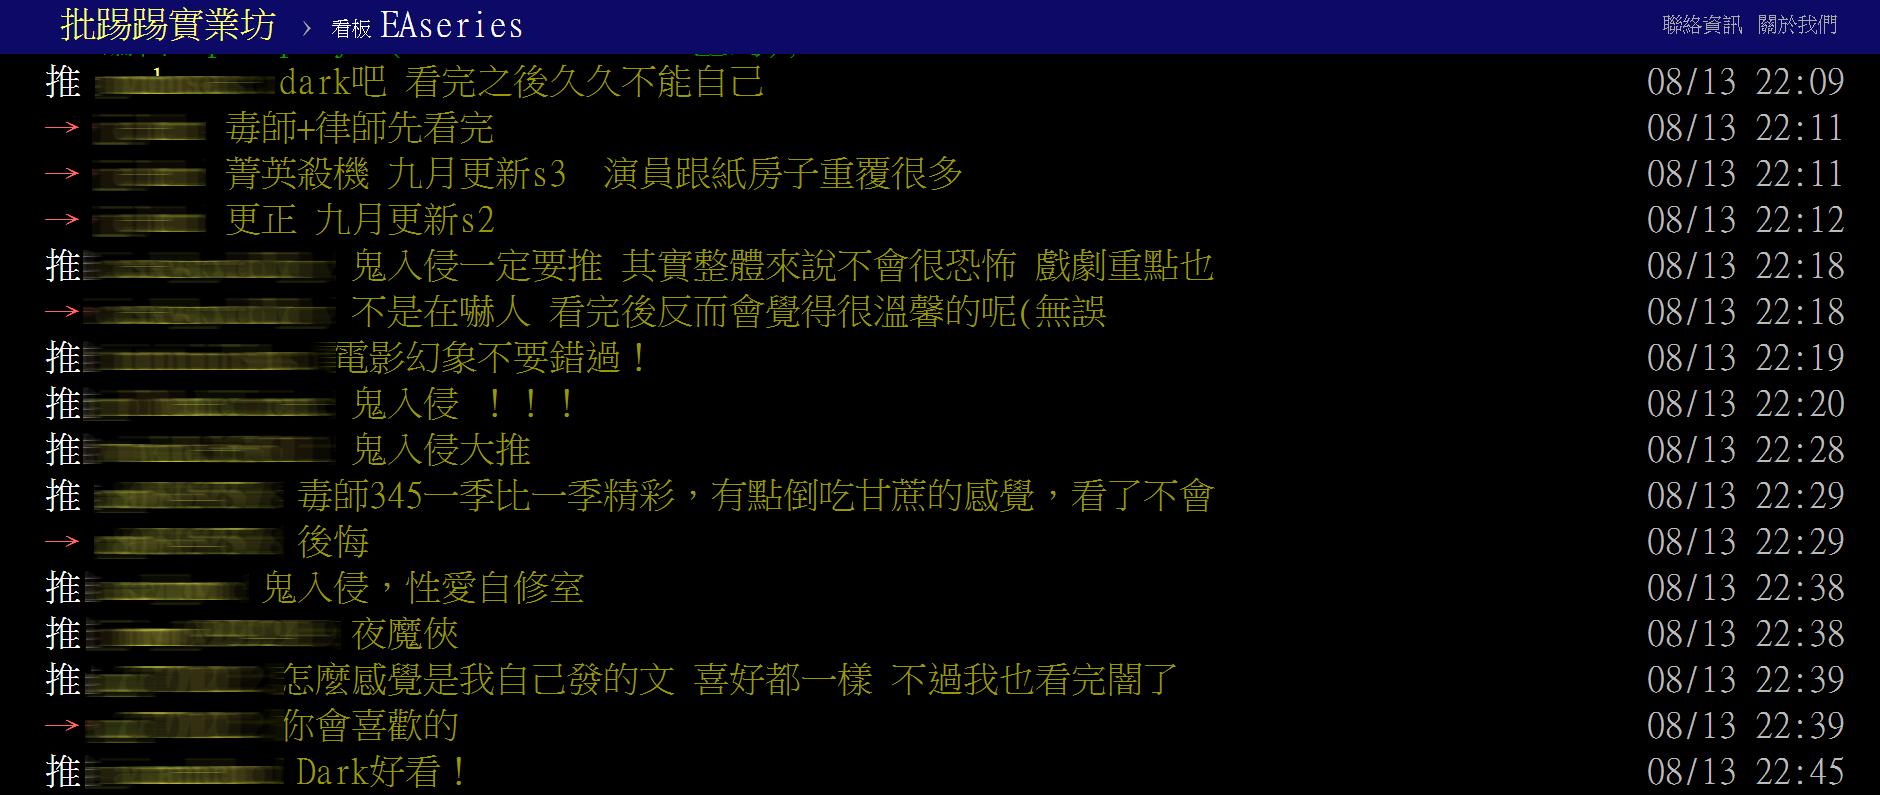 PTT美劇版畫面截圖